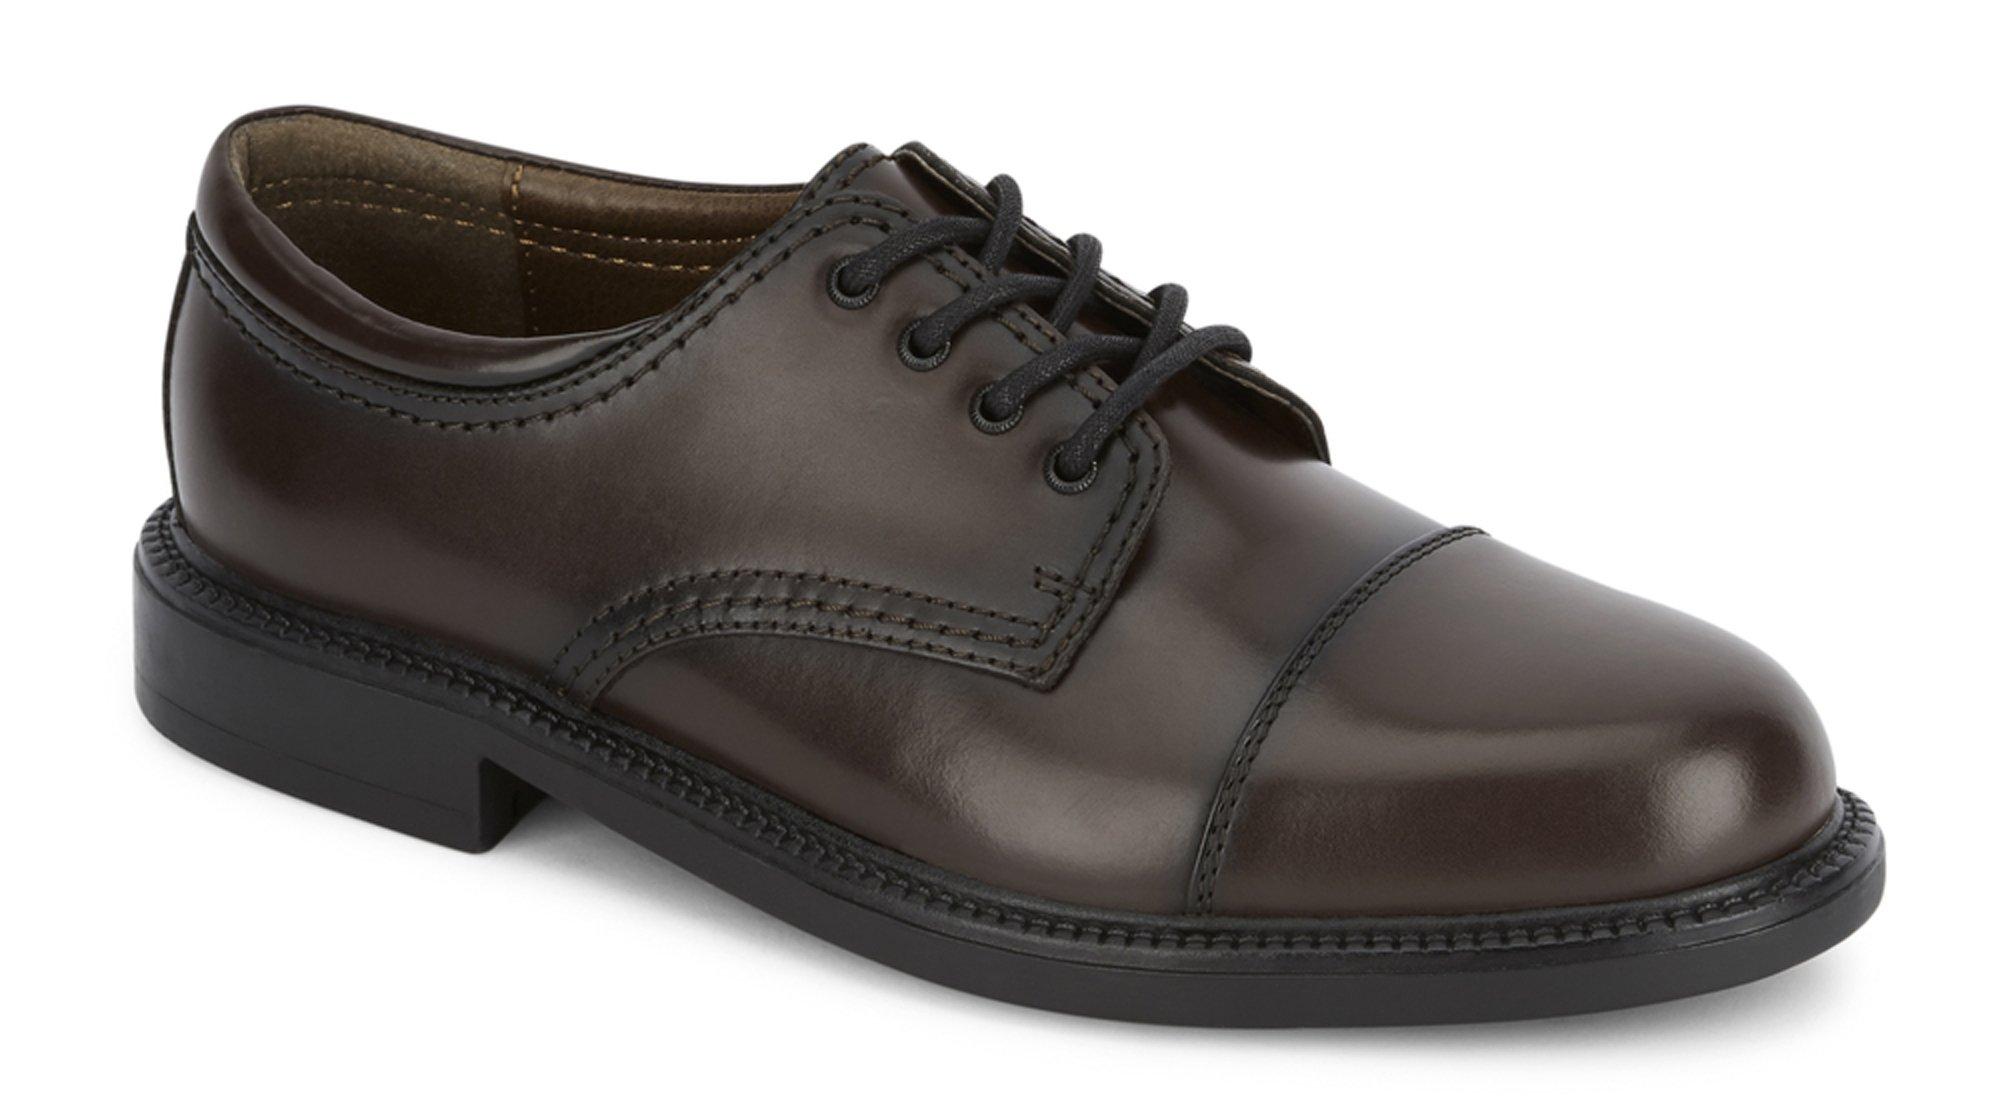 Dockers Men's Gordon Leather Oxford Dress Shoe,Cordovan,11.5 M US